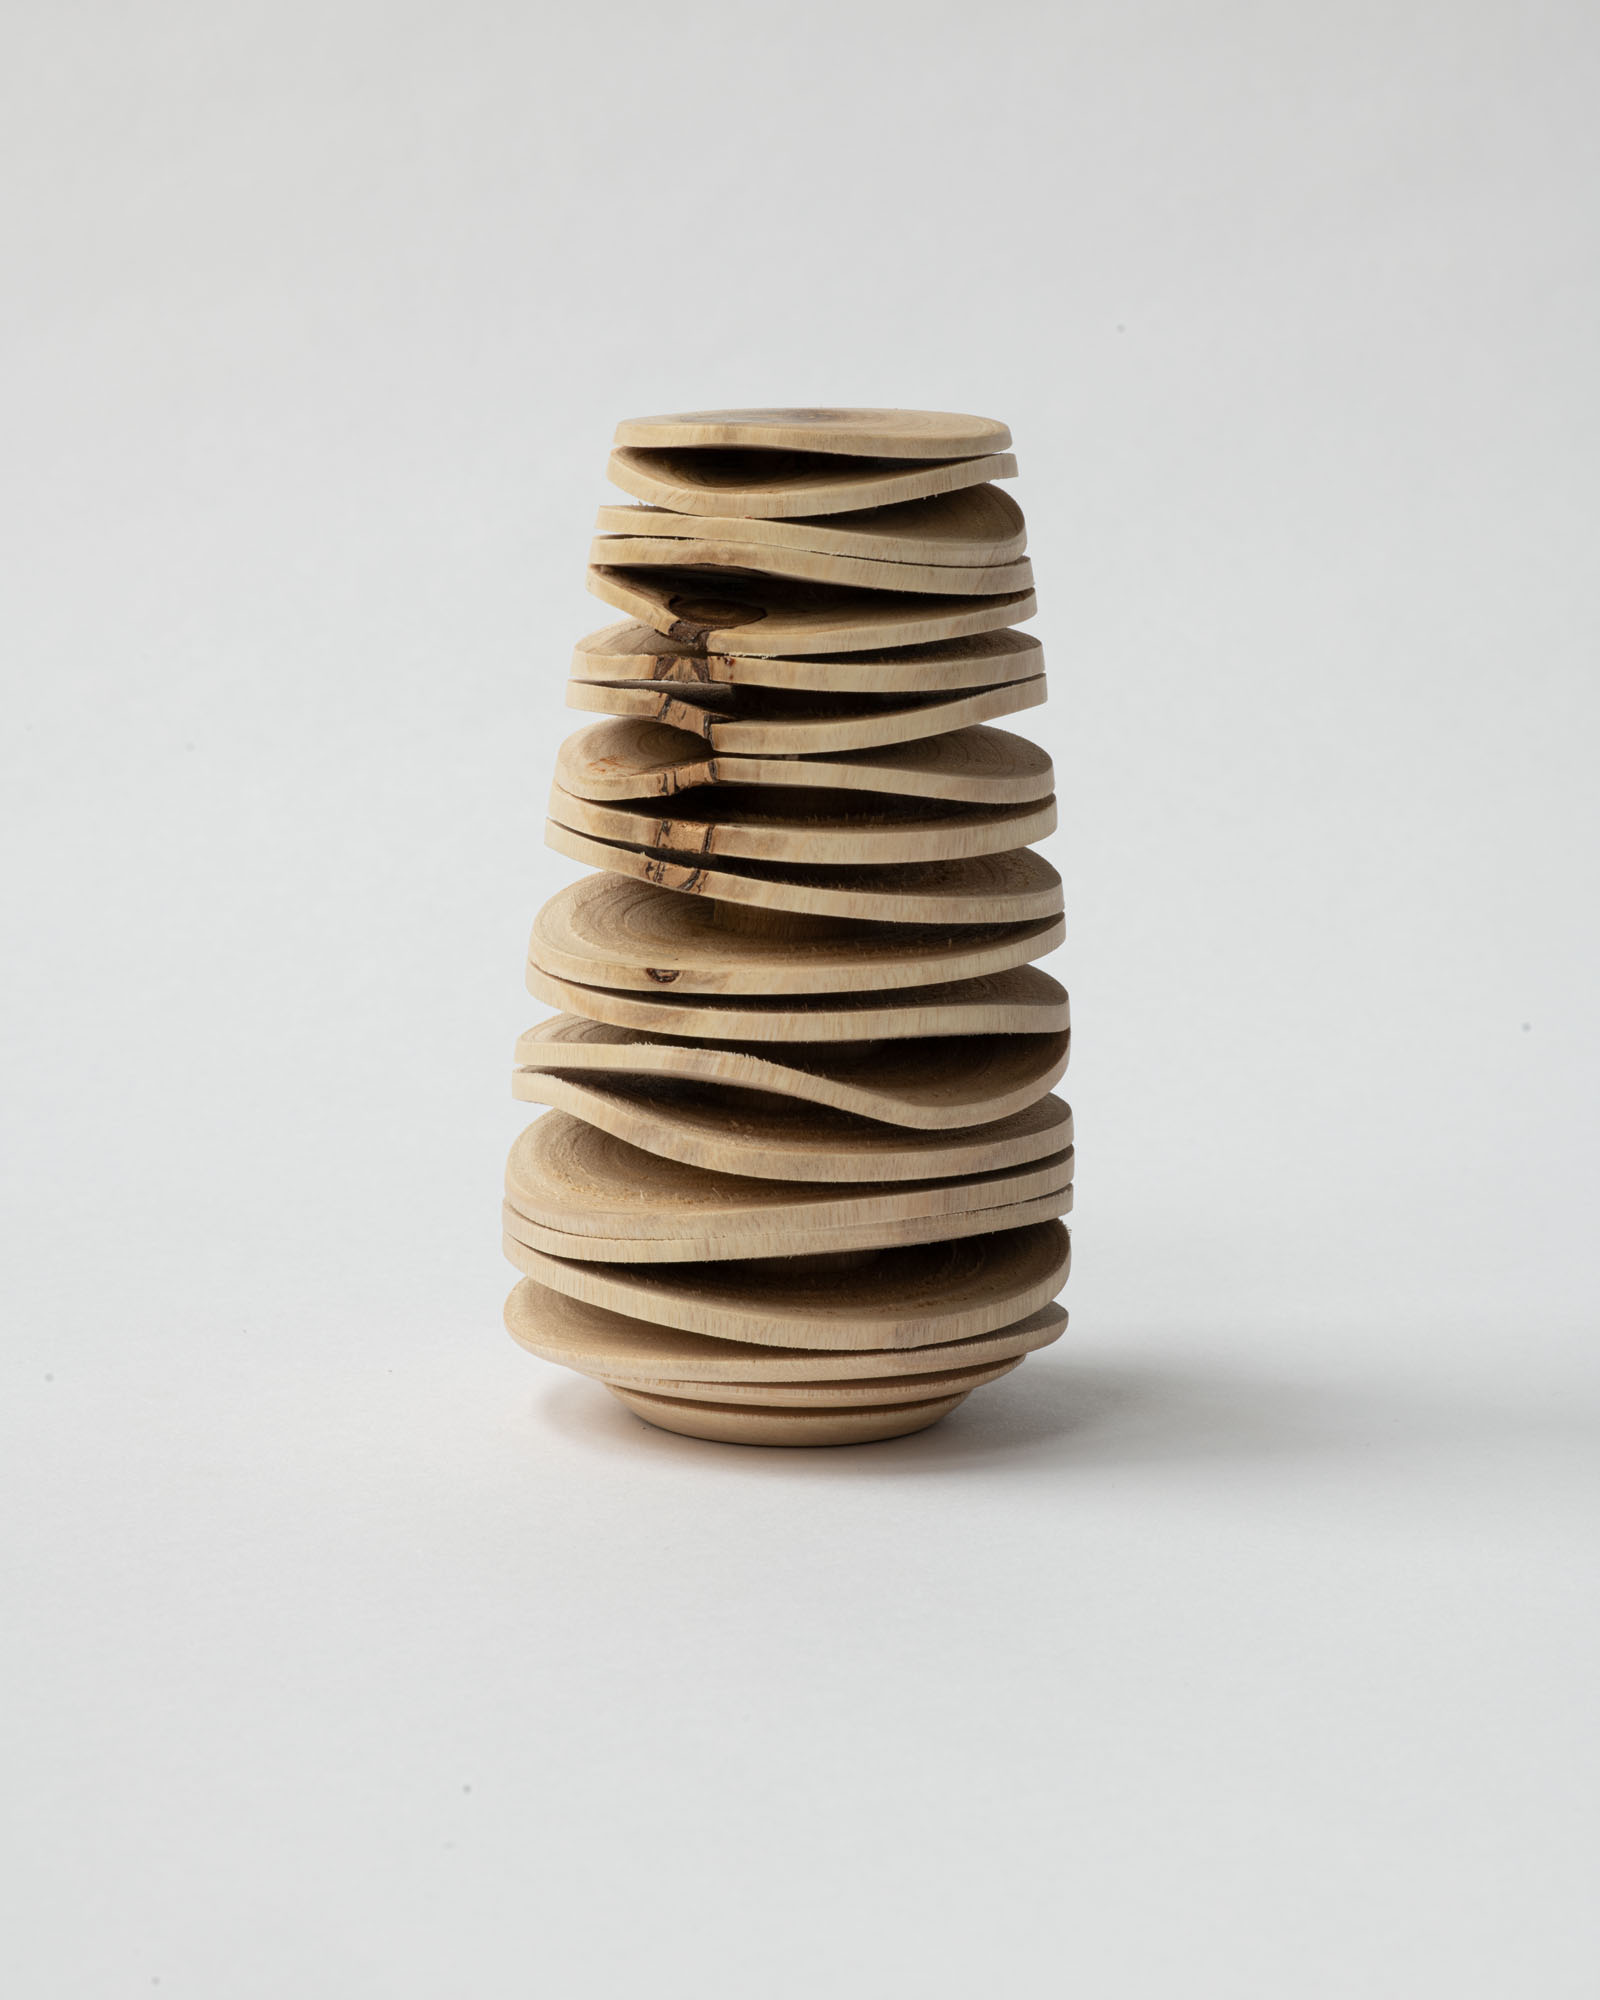 Ralph Shuttleworth 'small warped sculpture'